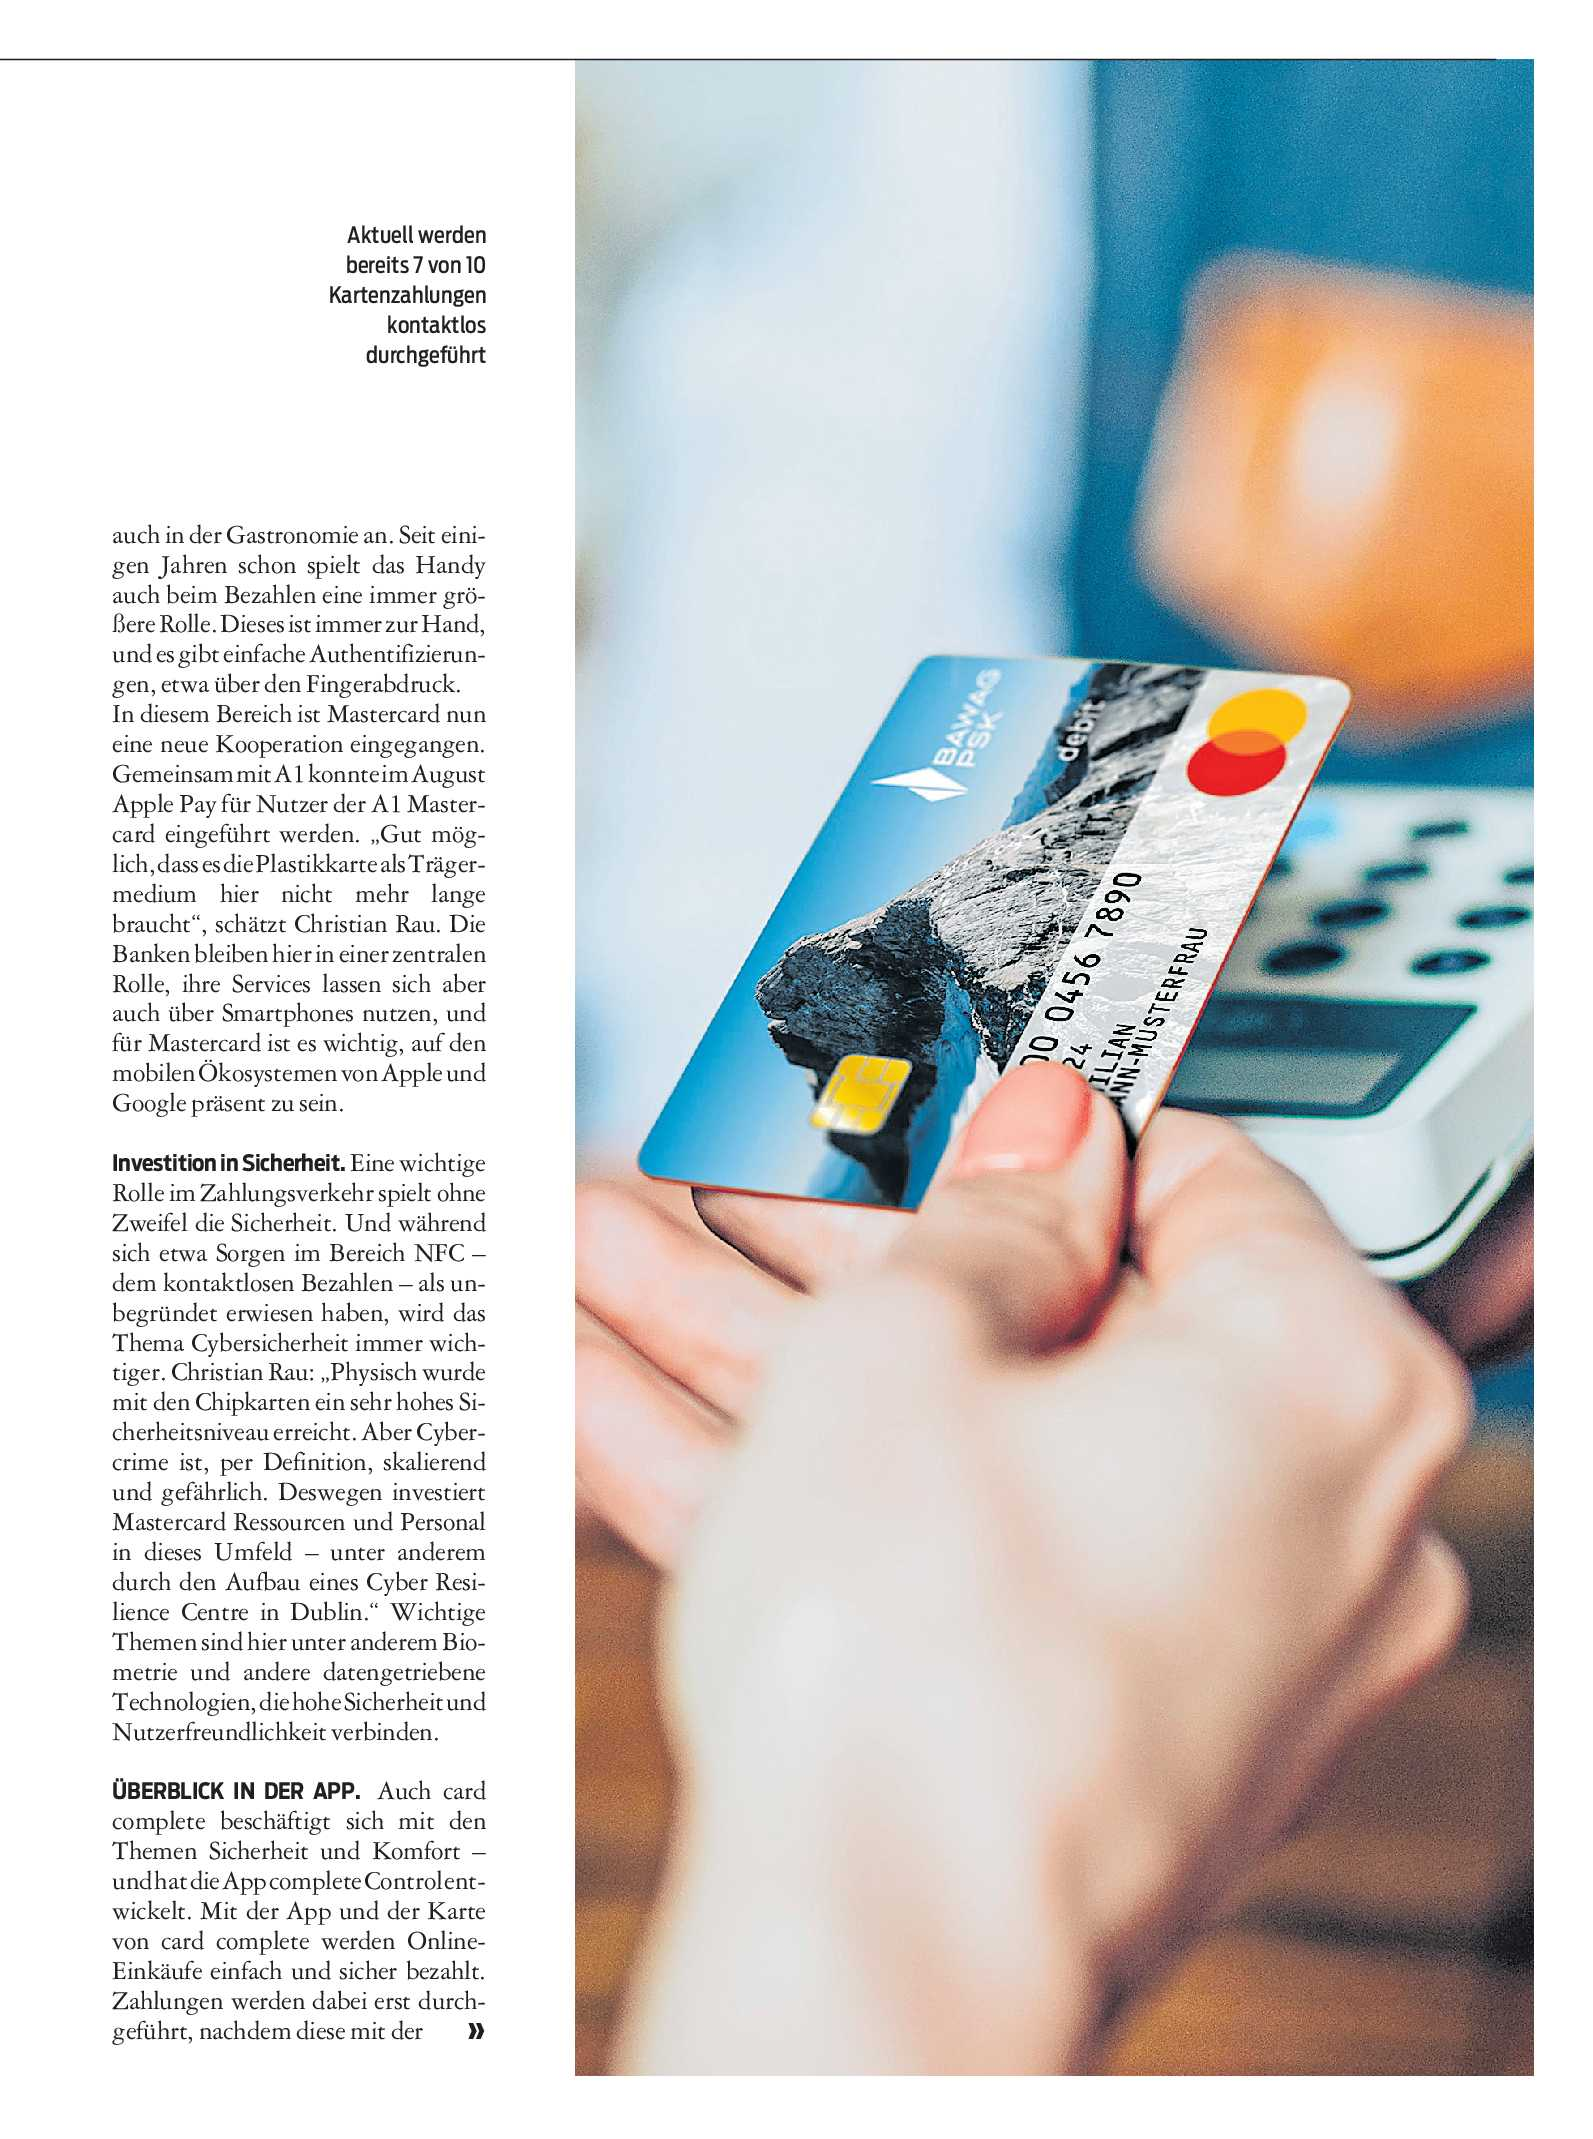 public/epaper/imported/20201118/kurier/magazin/magazin_20201118_101.jpg